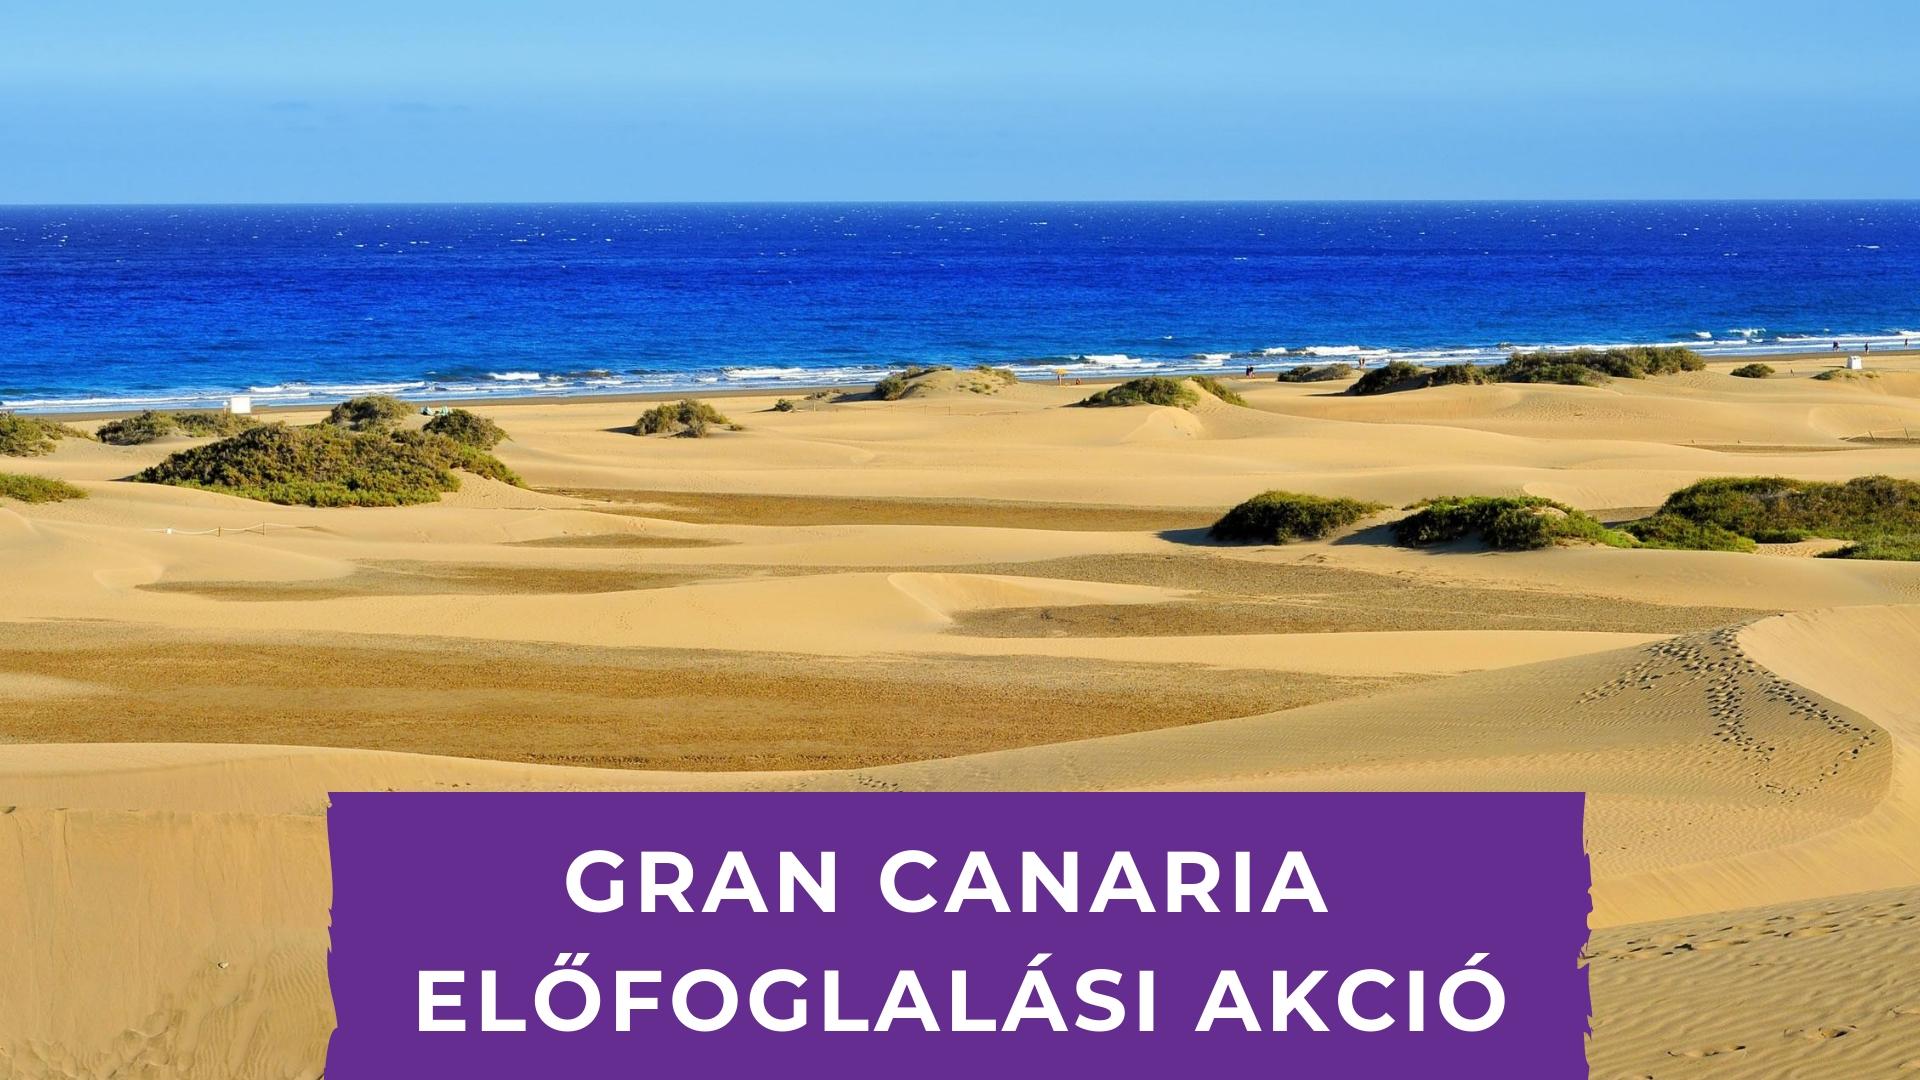 Gran canaria ELŐFOGLALÁSI AKCIÓ 0